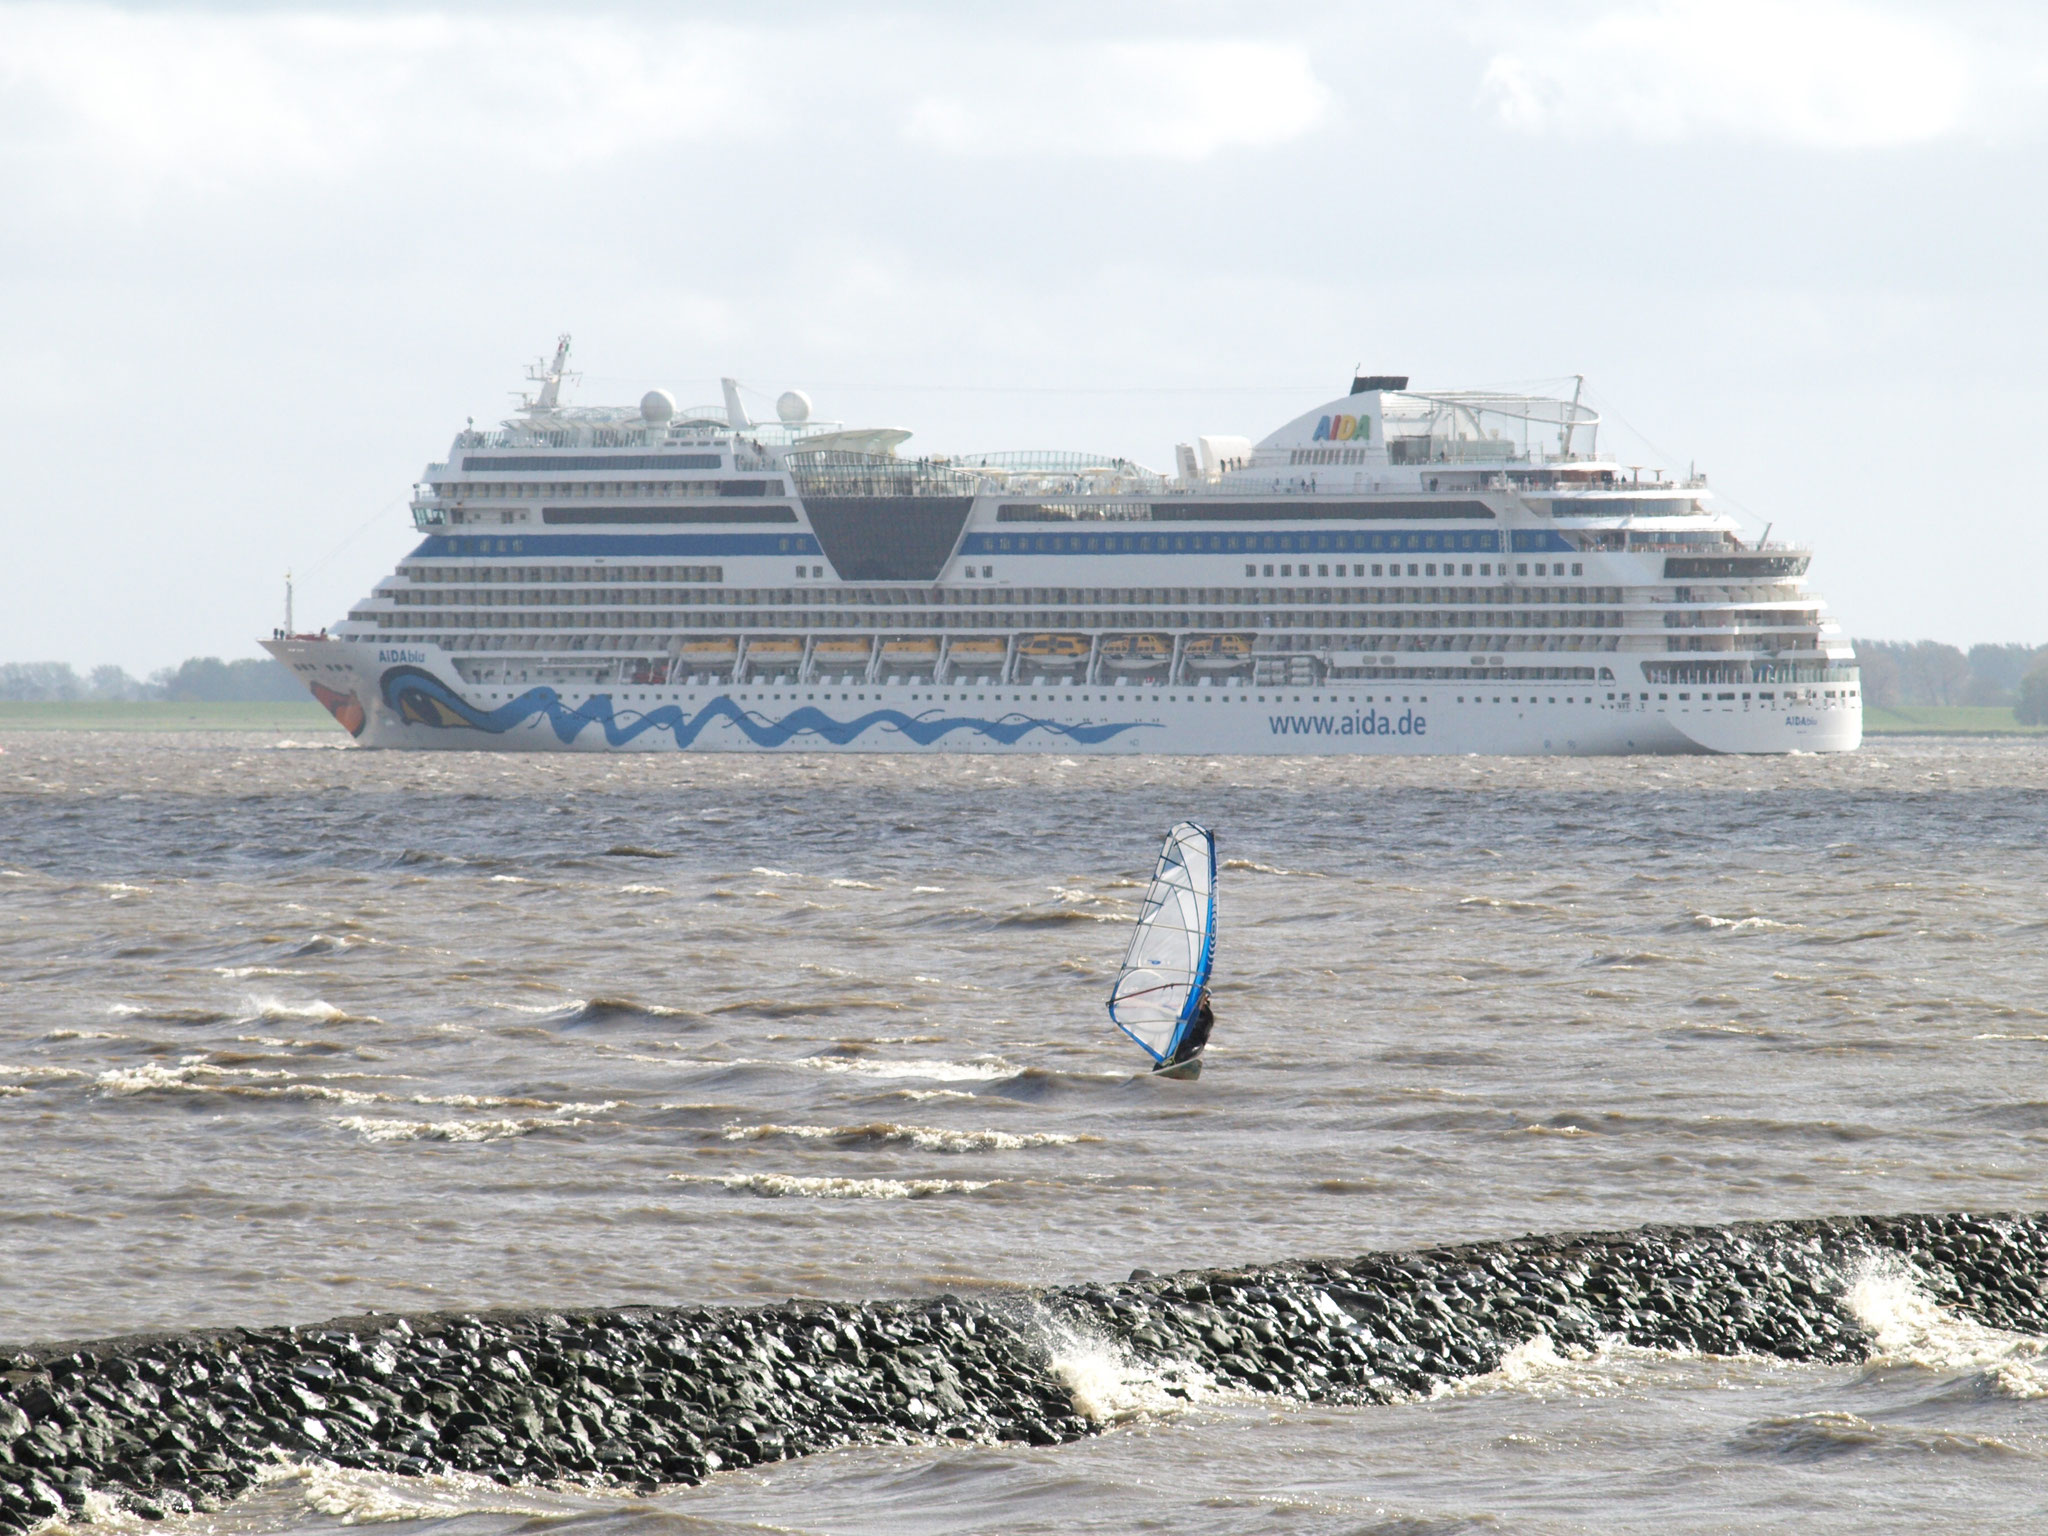 Aida blu auf dem Weg nach Hamburg,...